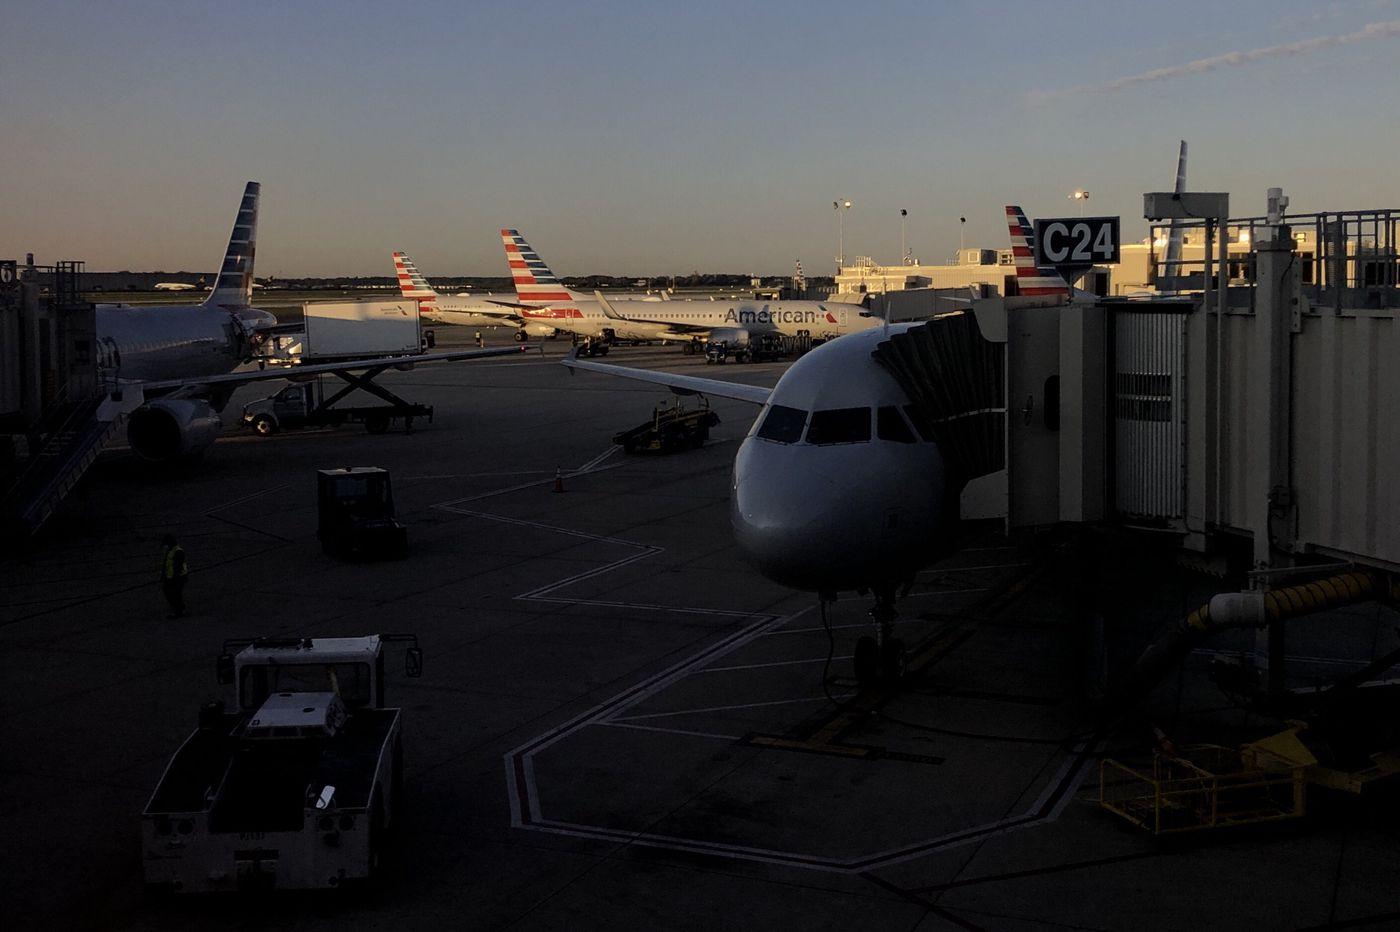 Hundreds of American Airlines flight attendants are losing jobs at Philadelphia International Airport